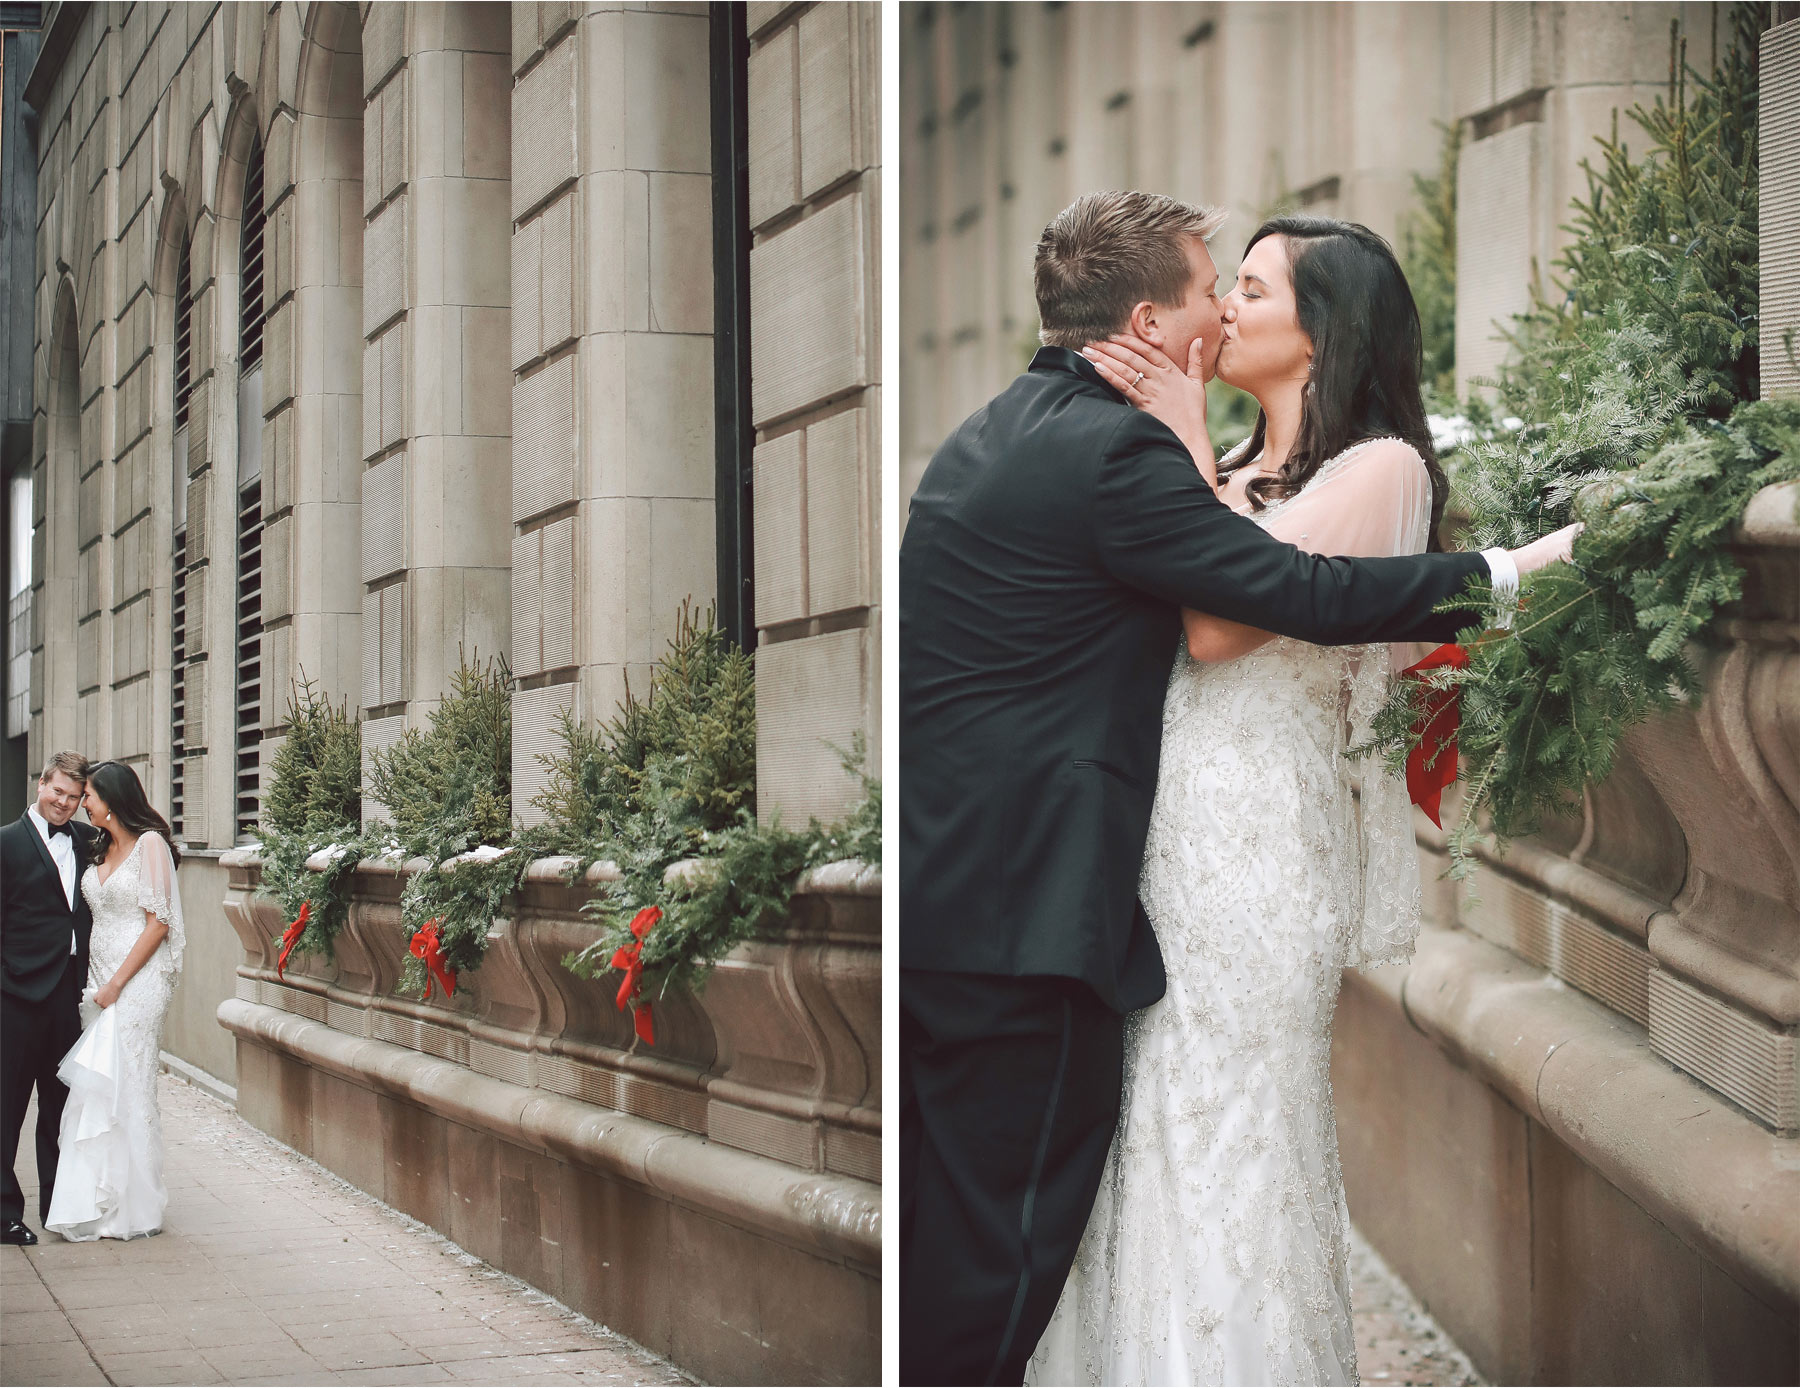 04-Saint-Paul-Minnesota-Wedding-Photography-by-Vick-Photography-Saint-Paul-Hotel-First-Look-Couple-Winter-Wedding-Sami-and-Nick.jpg